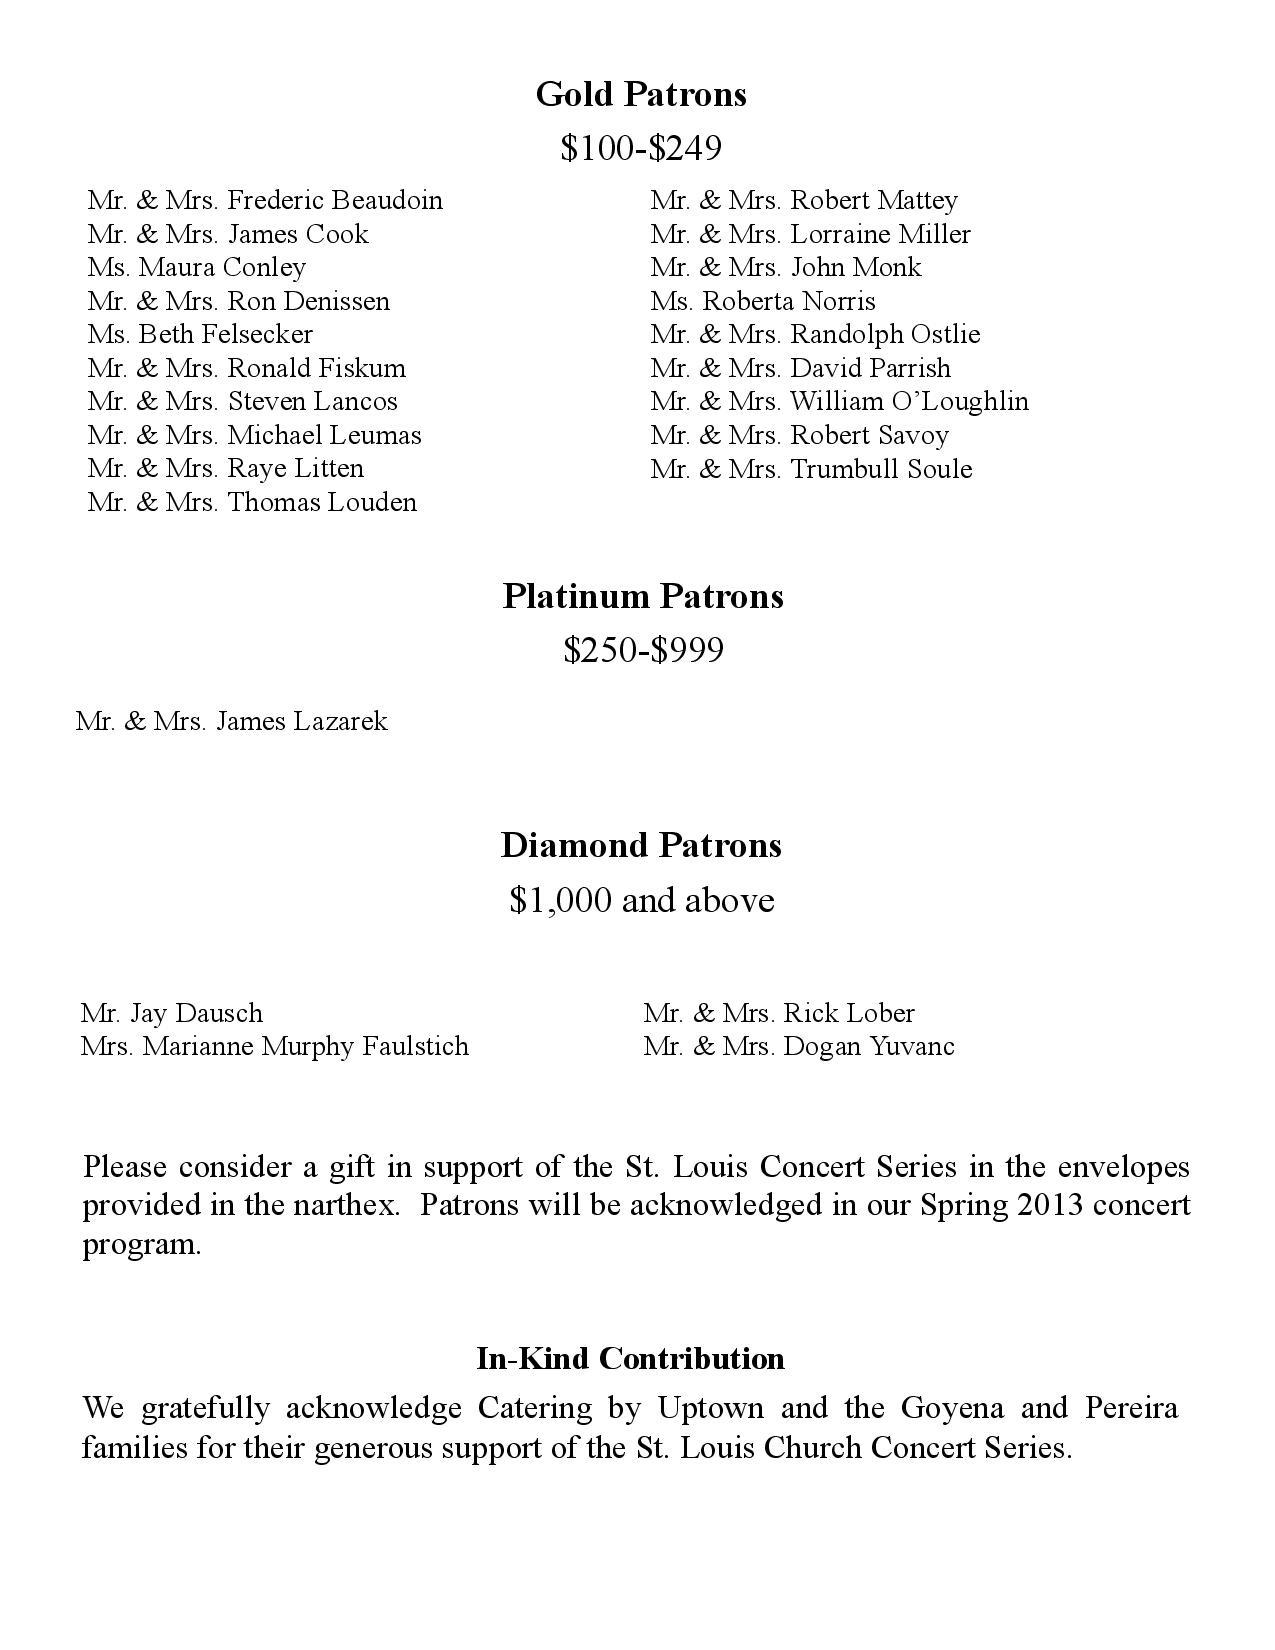 2013-04-21 Program Draft-page-013.jpg